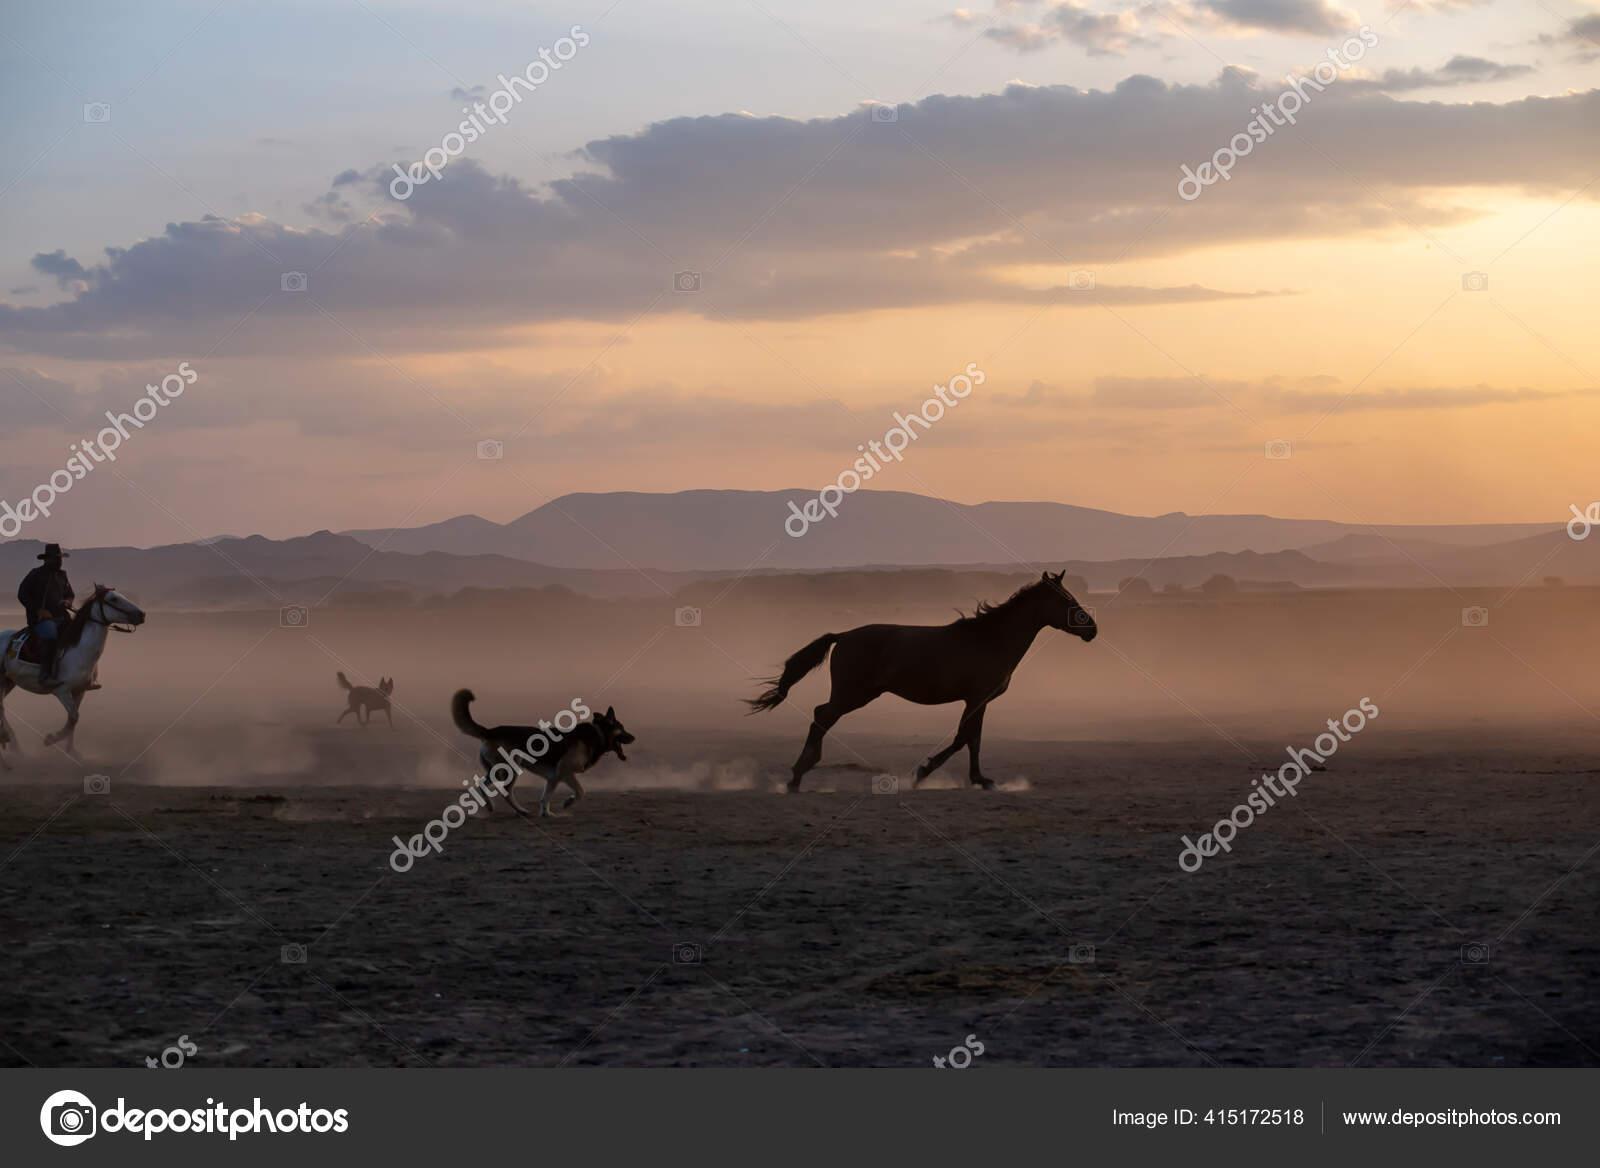 Wild Horses Run Foggy Sunset Wild Horses Running Dust Hormetci Stock Photo C Attractionart 415172518